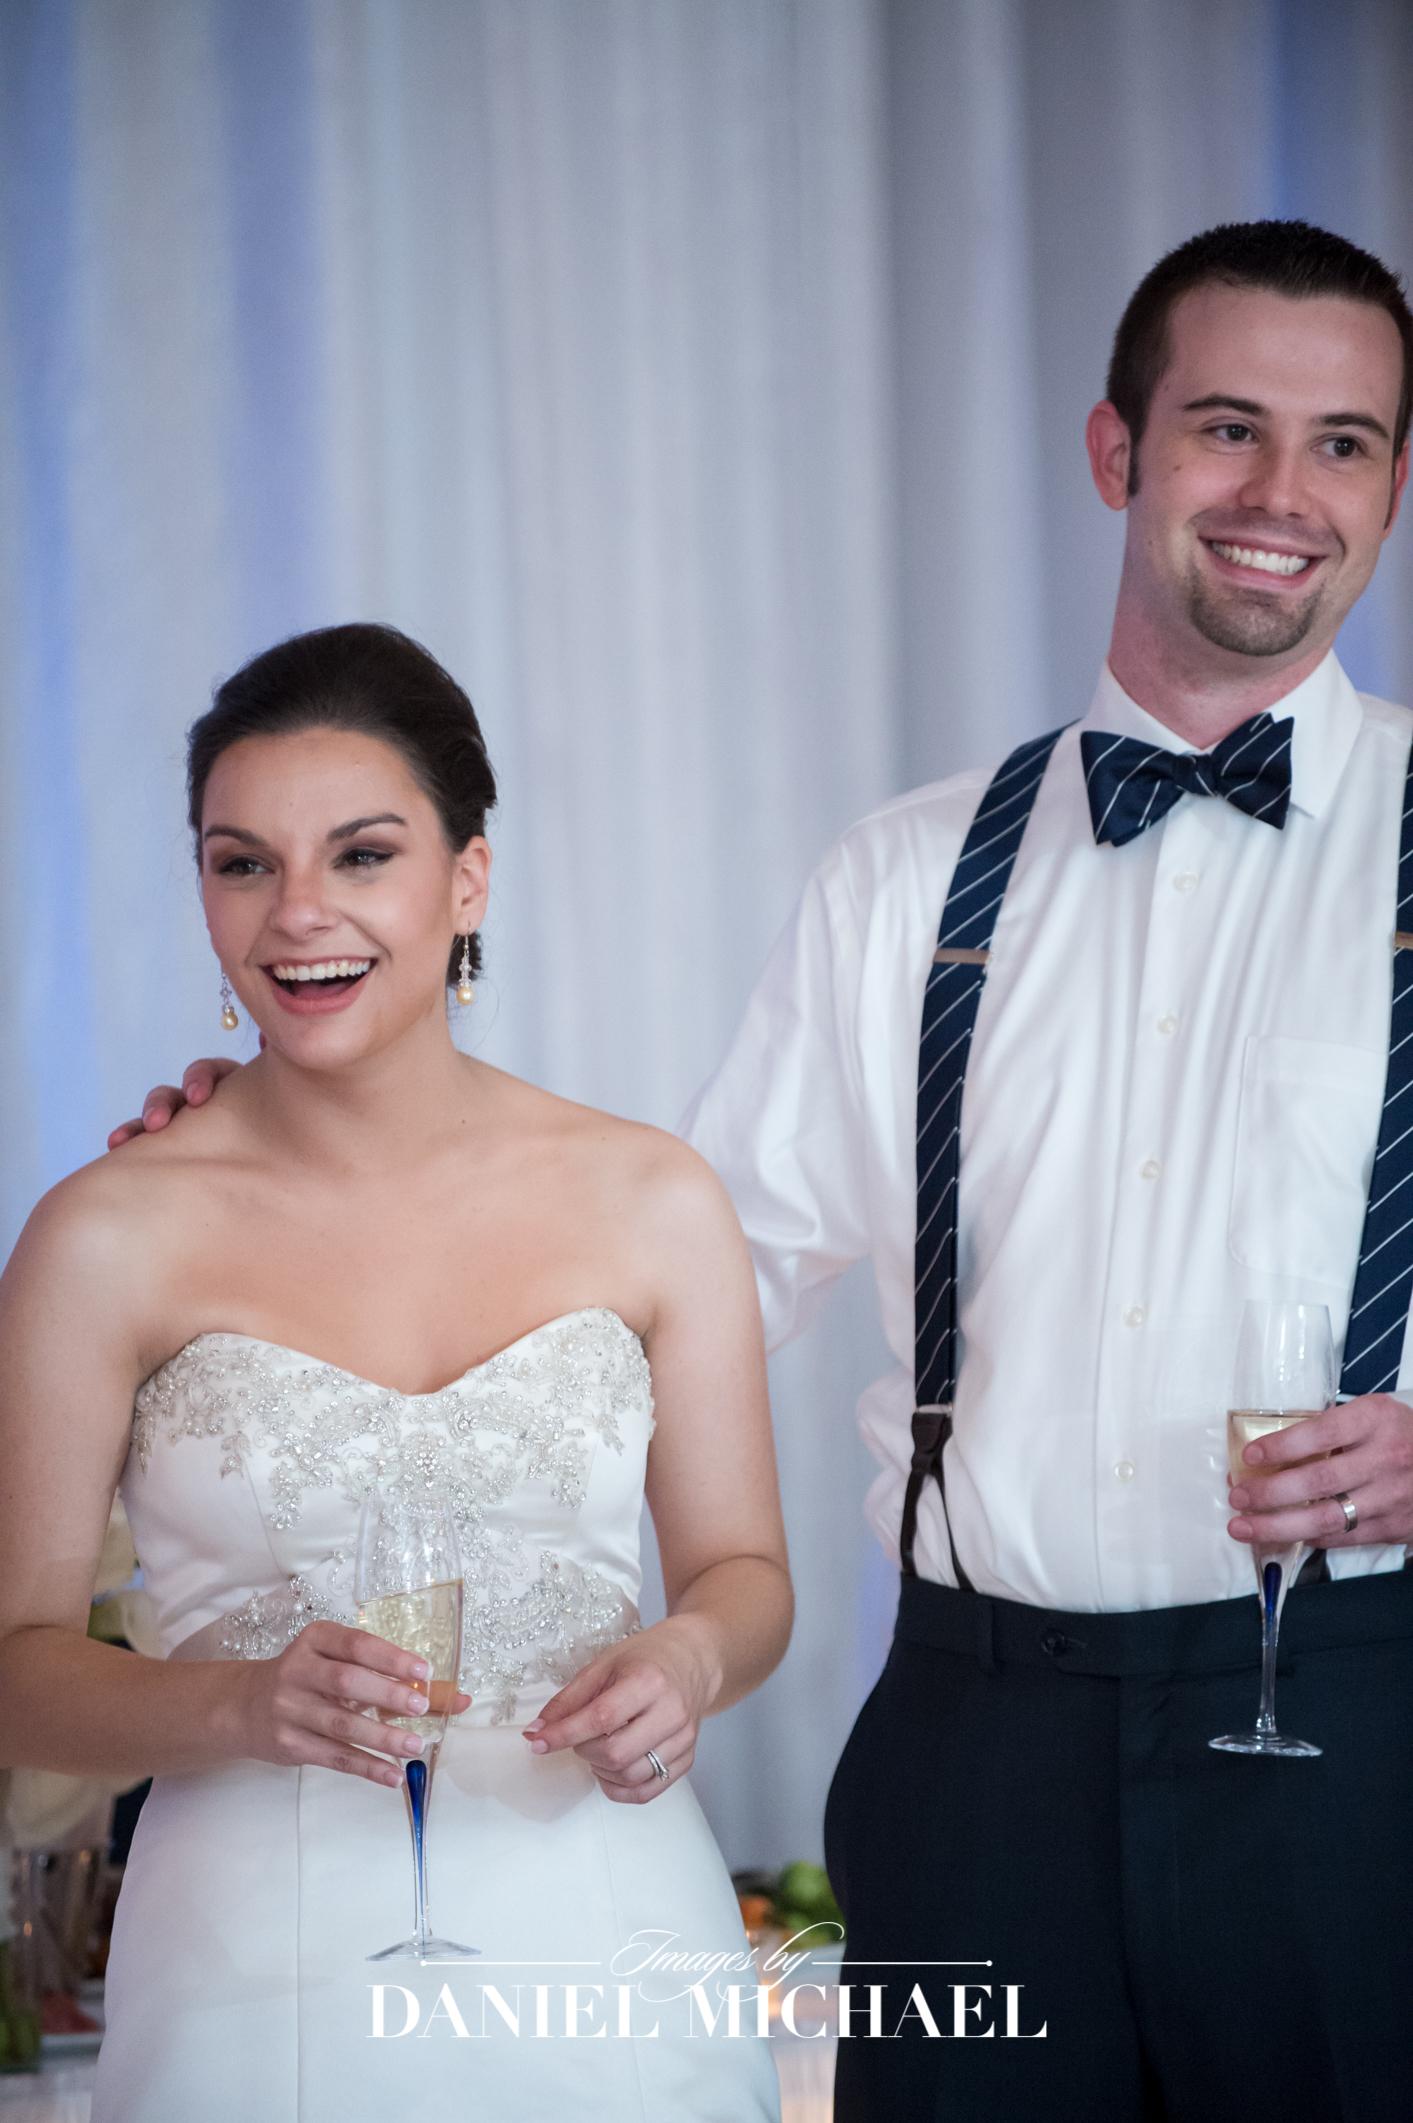 Marriott North West Chester Venue Wedding Photographer